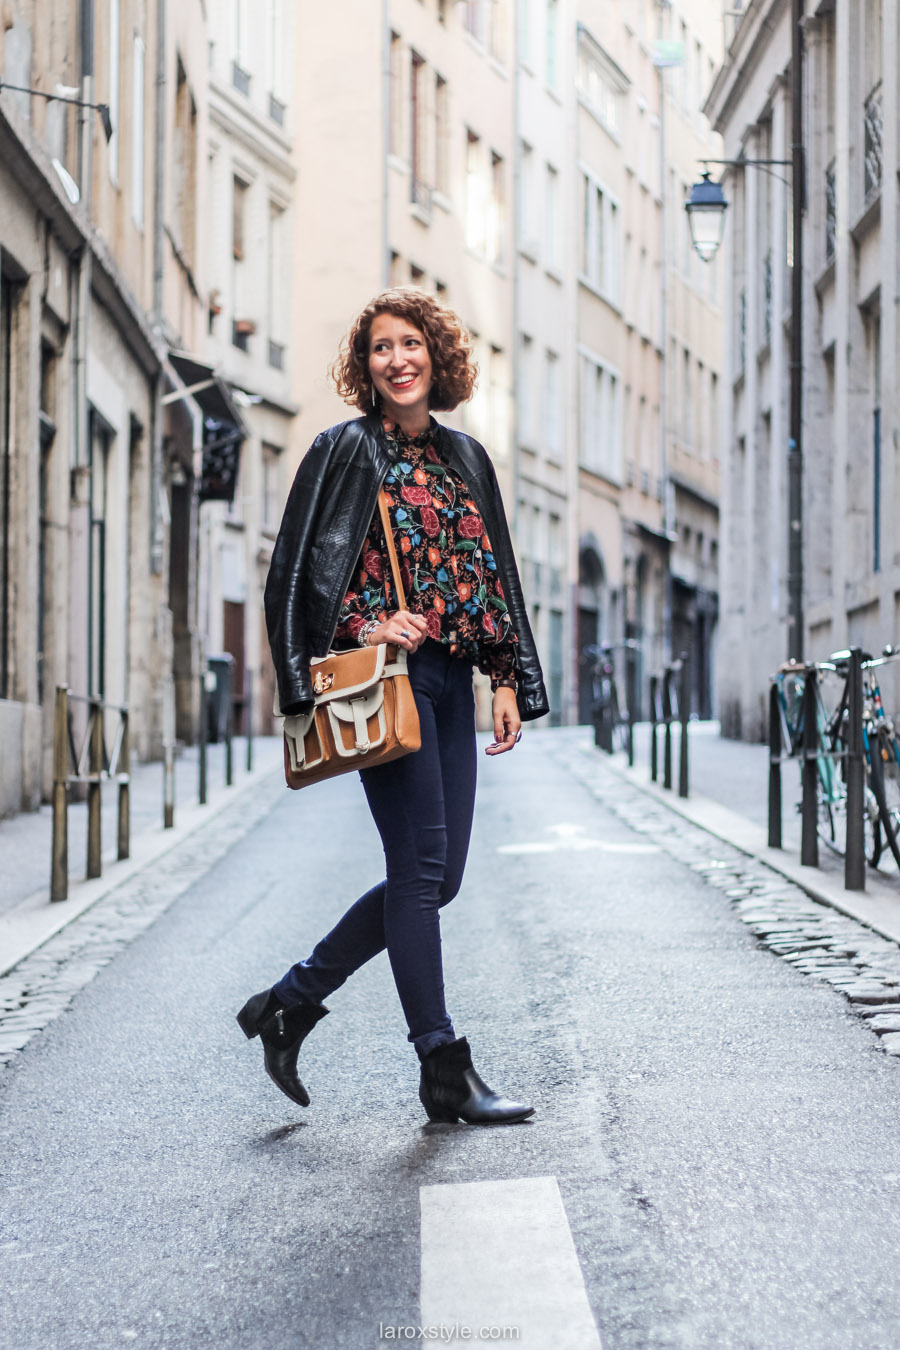 blouse fleurie - sac vintage - laroxstyle blog mode lyon-12